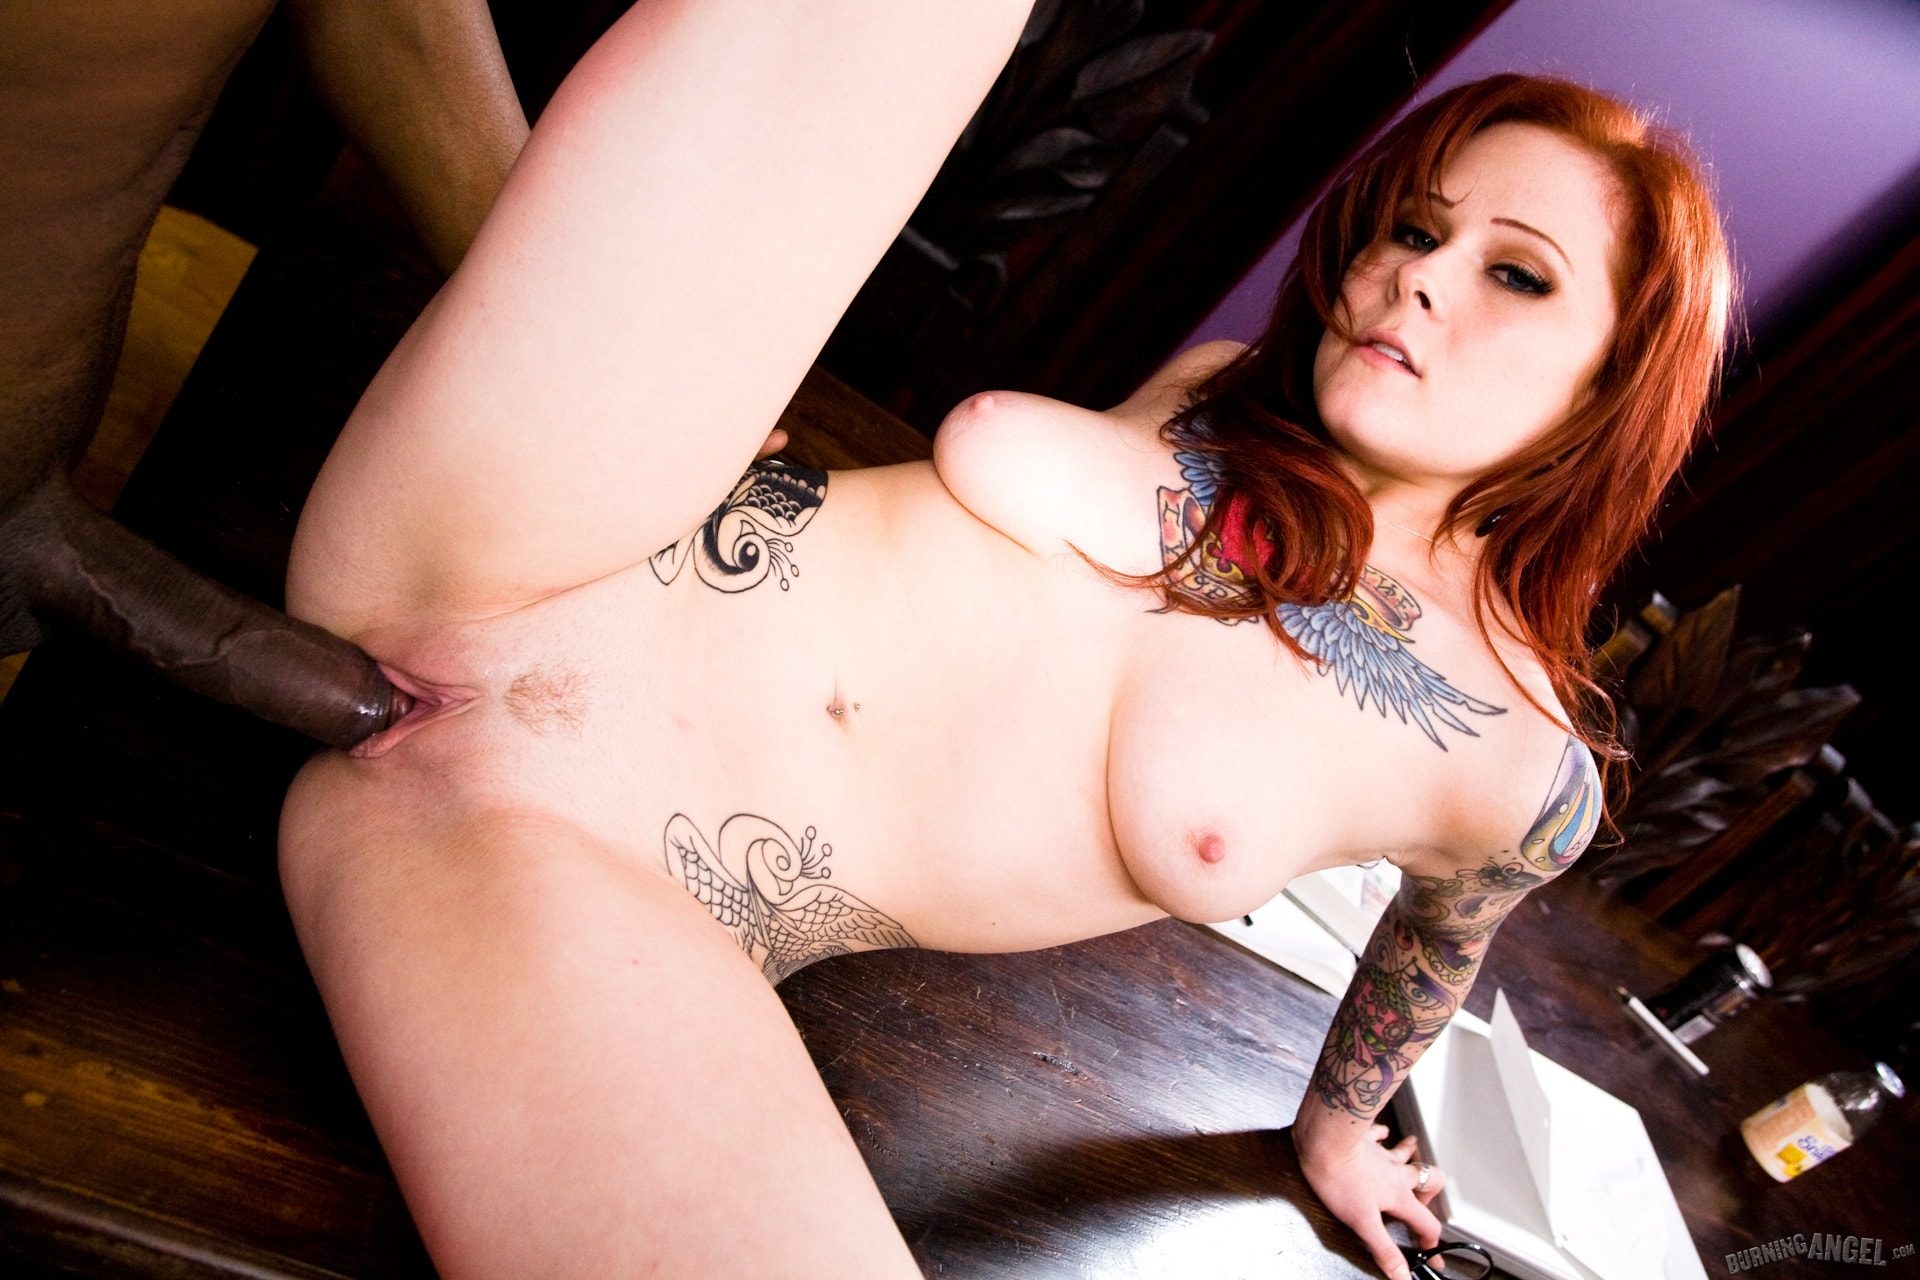 Burning Angel 'Fuck Me Like A Cat!' starring Misti Dawn (Photo 10)